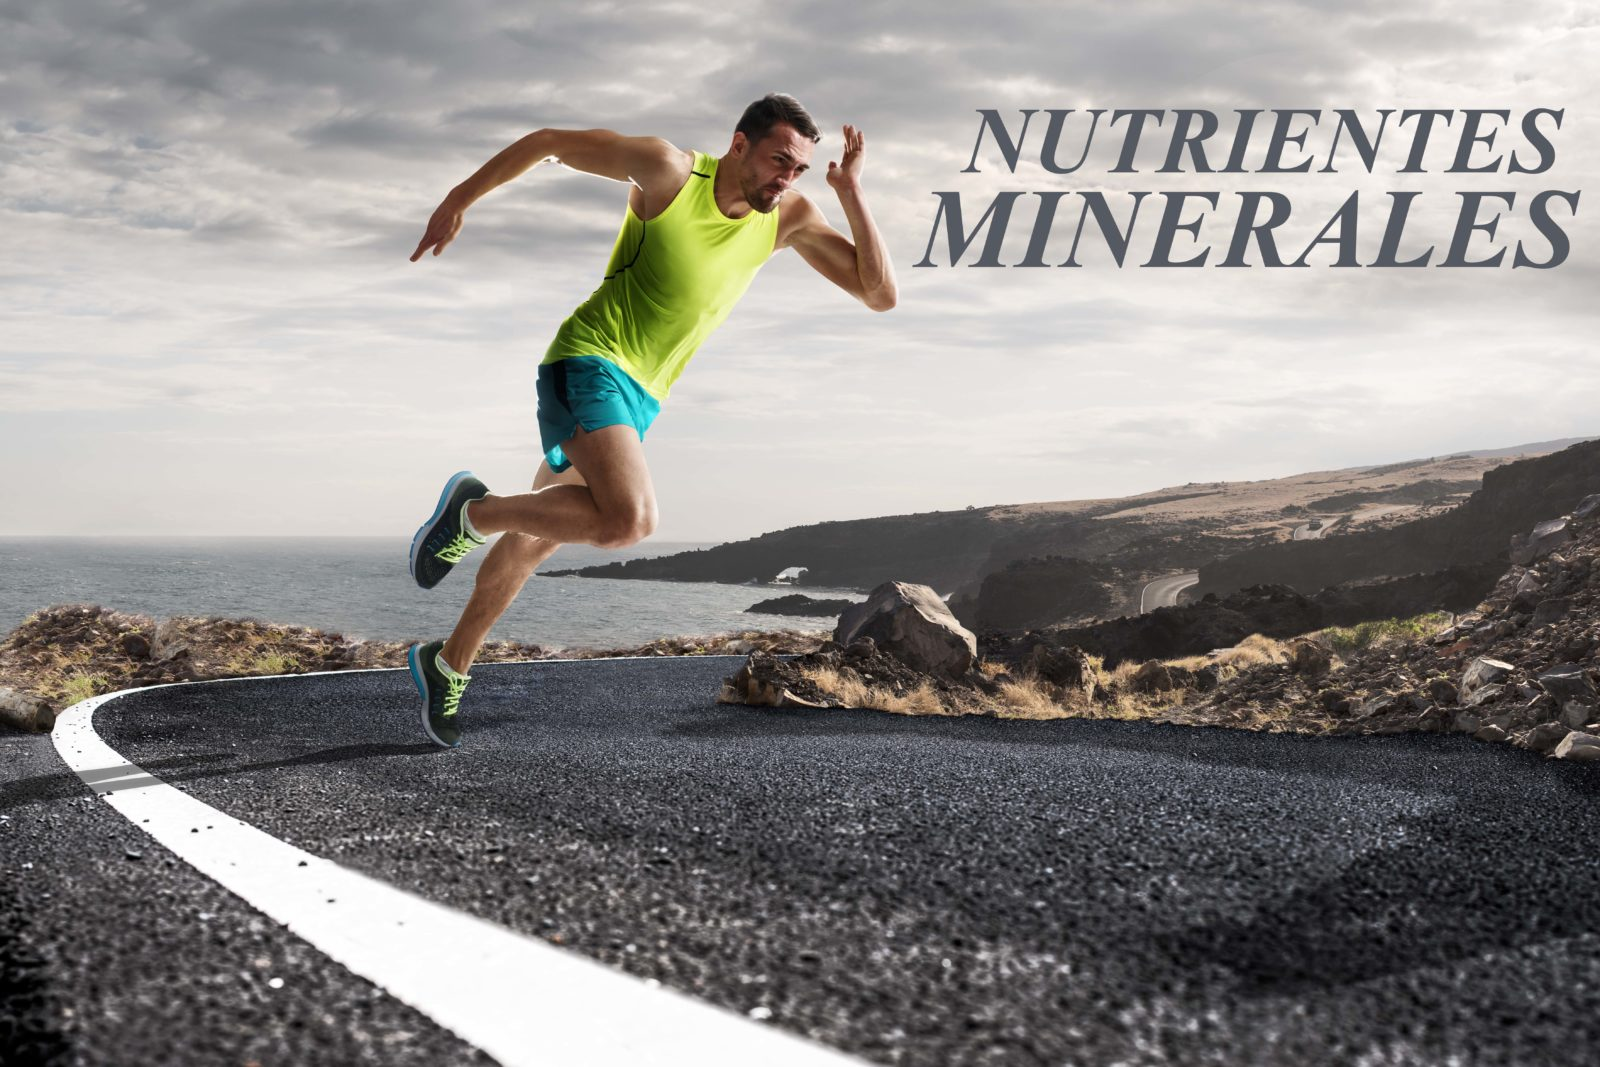 Nutrientes Minerales